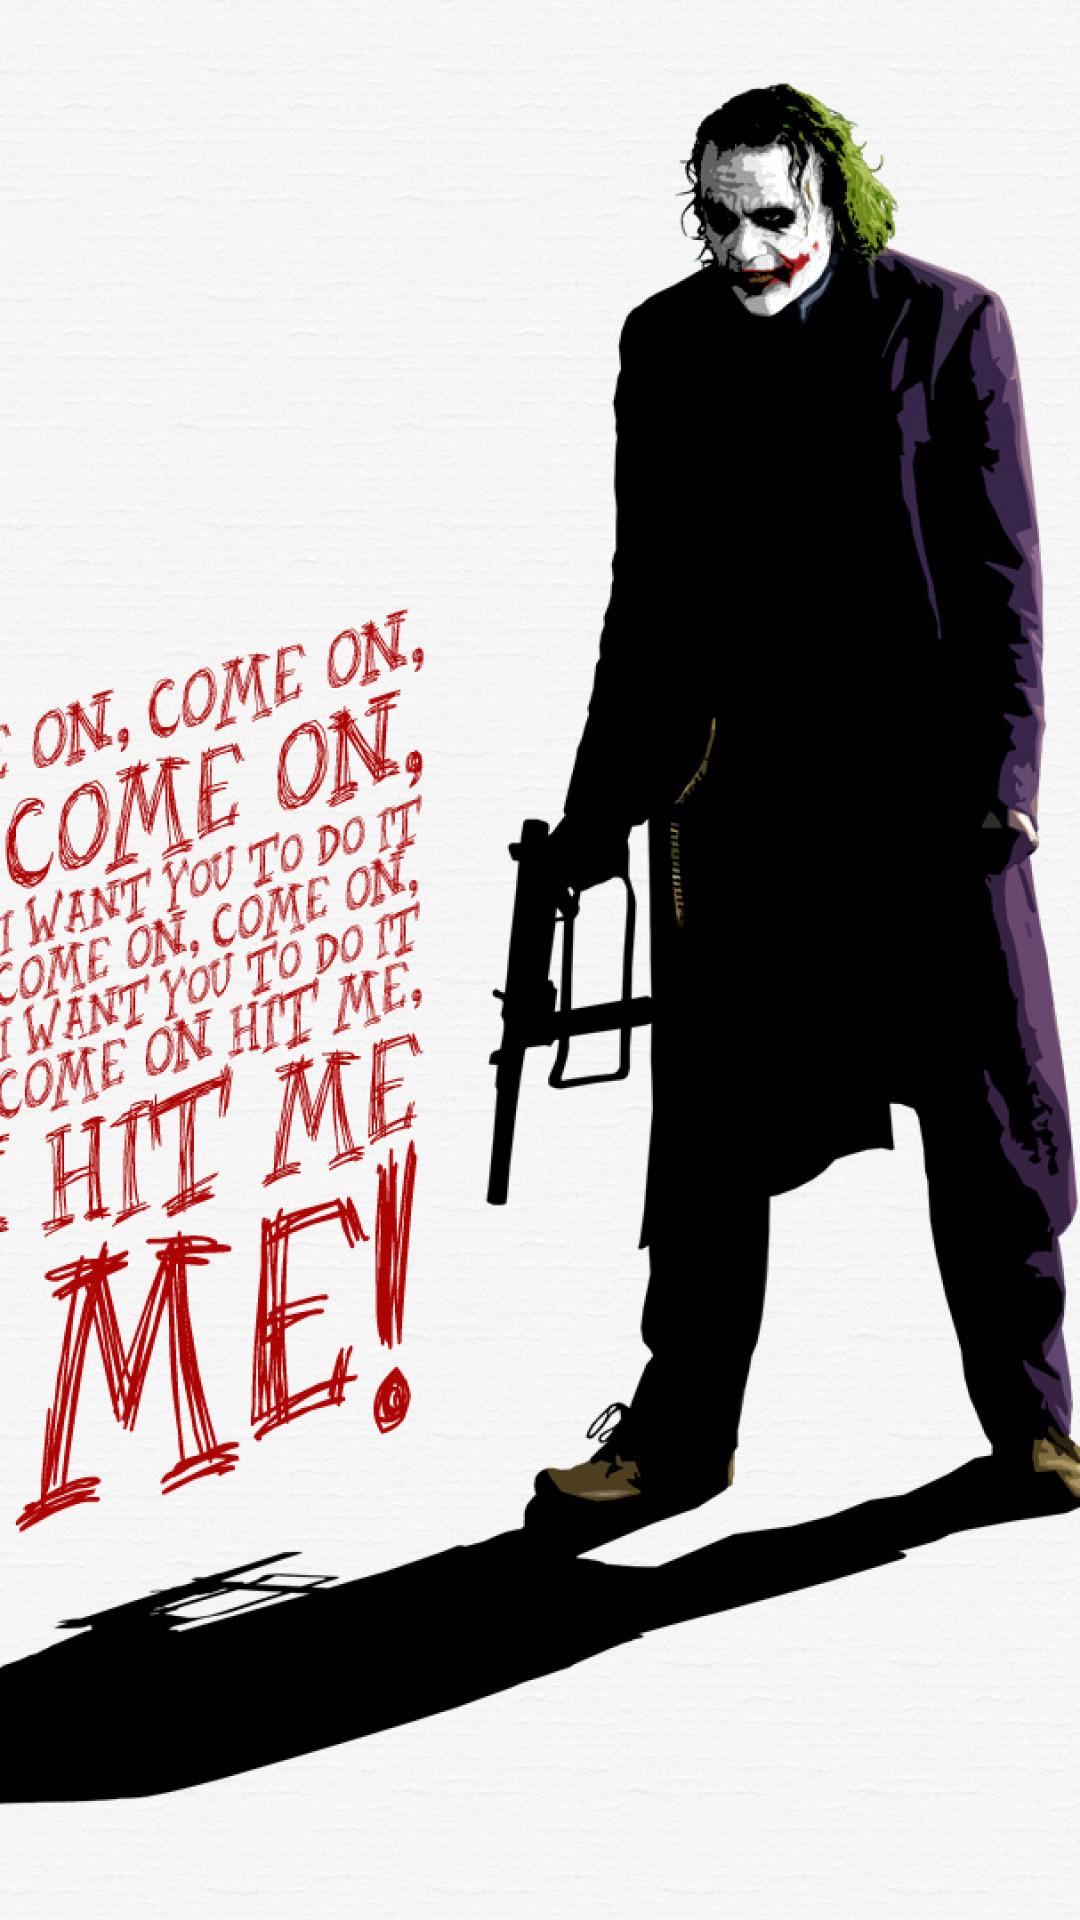 Batman Joker Quotes Mobile Wallpaper Joker Dark Knight Wallpaper 69 Images